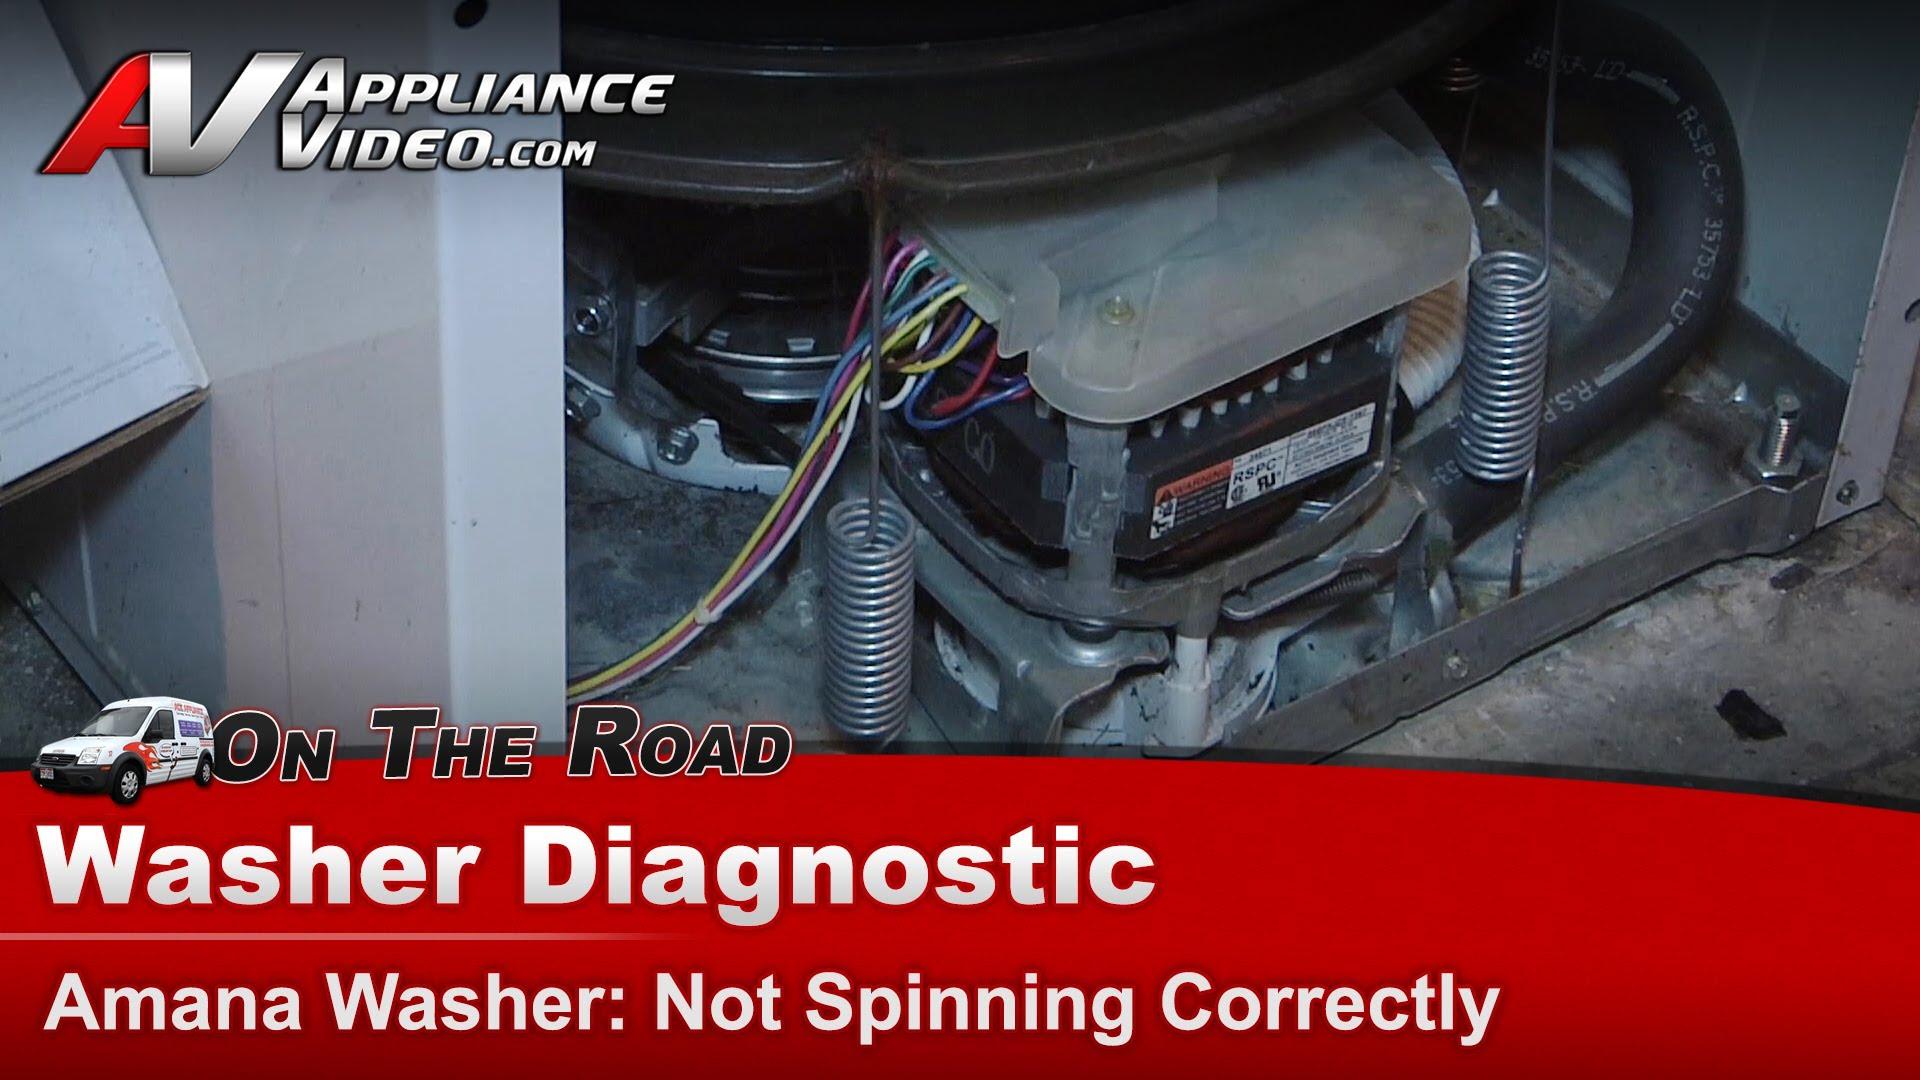 Amana Lw8203w2 Washer Diagnostic Not Spinning Correctly